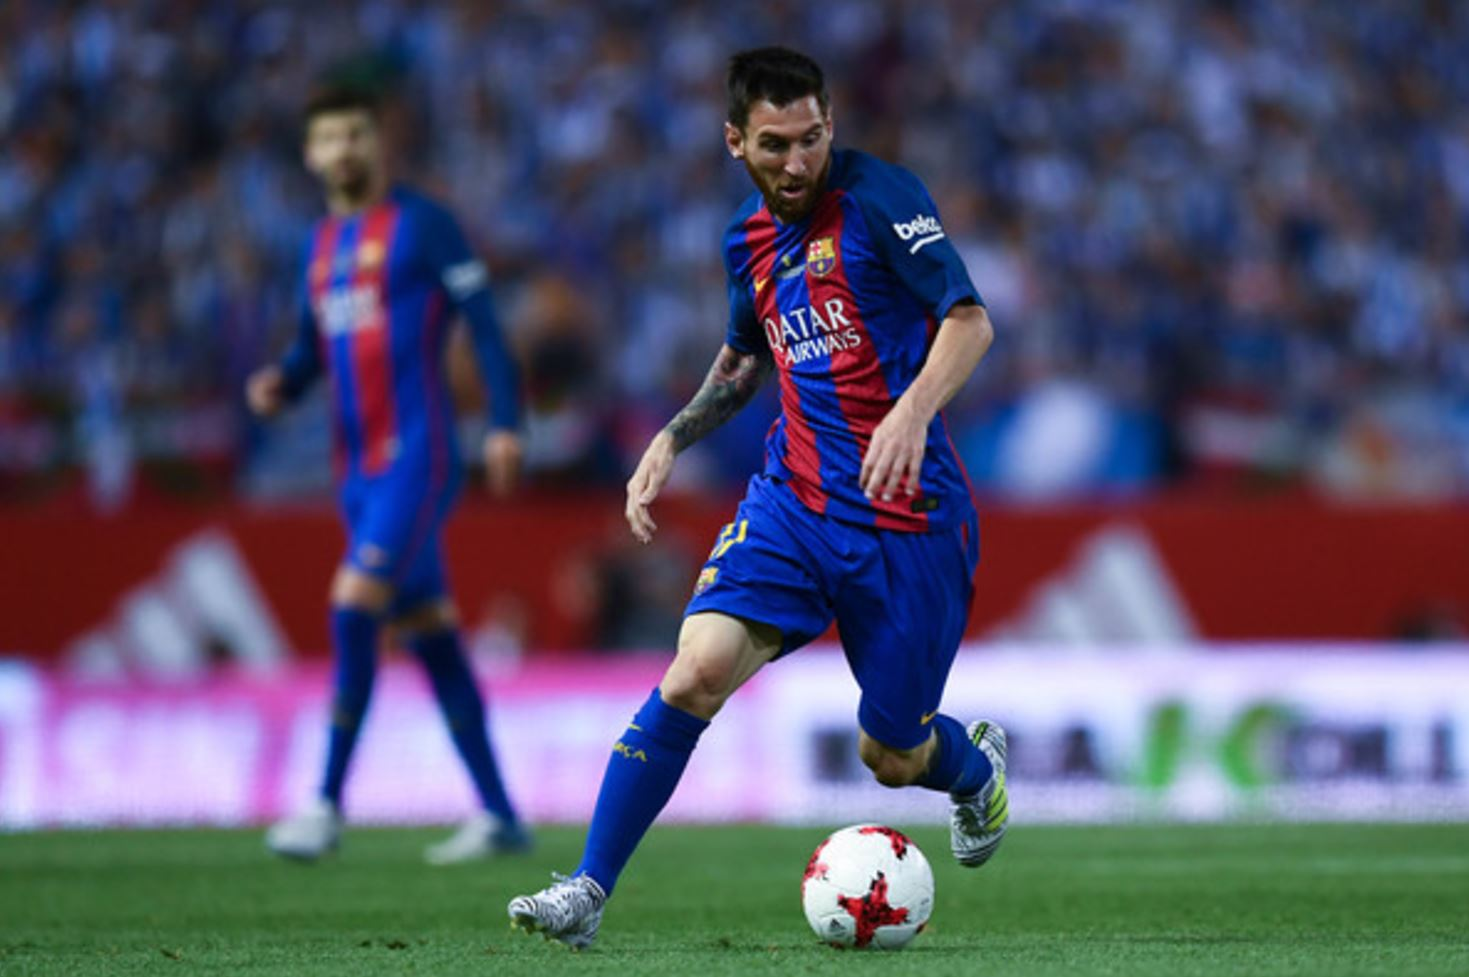 What Nemeziz Boot is Lionel Messi